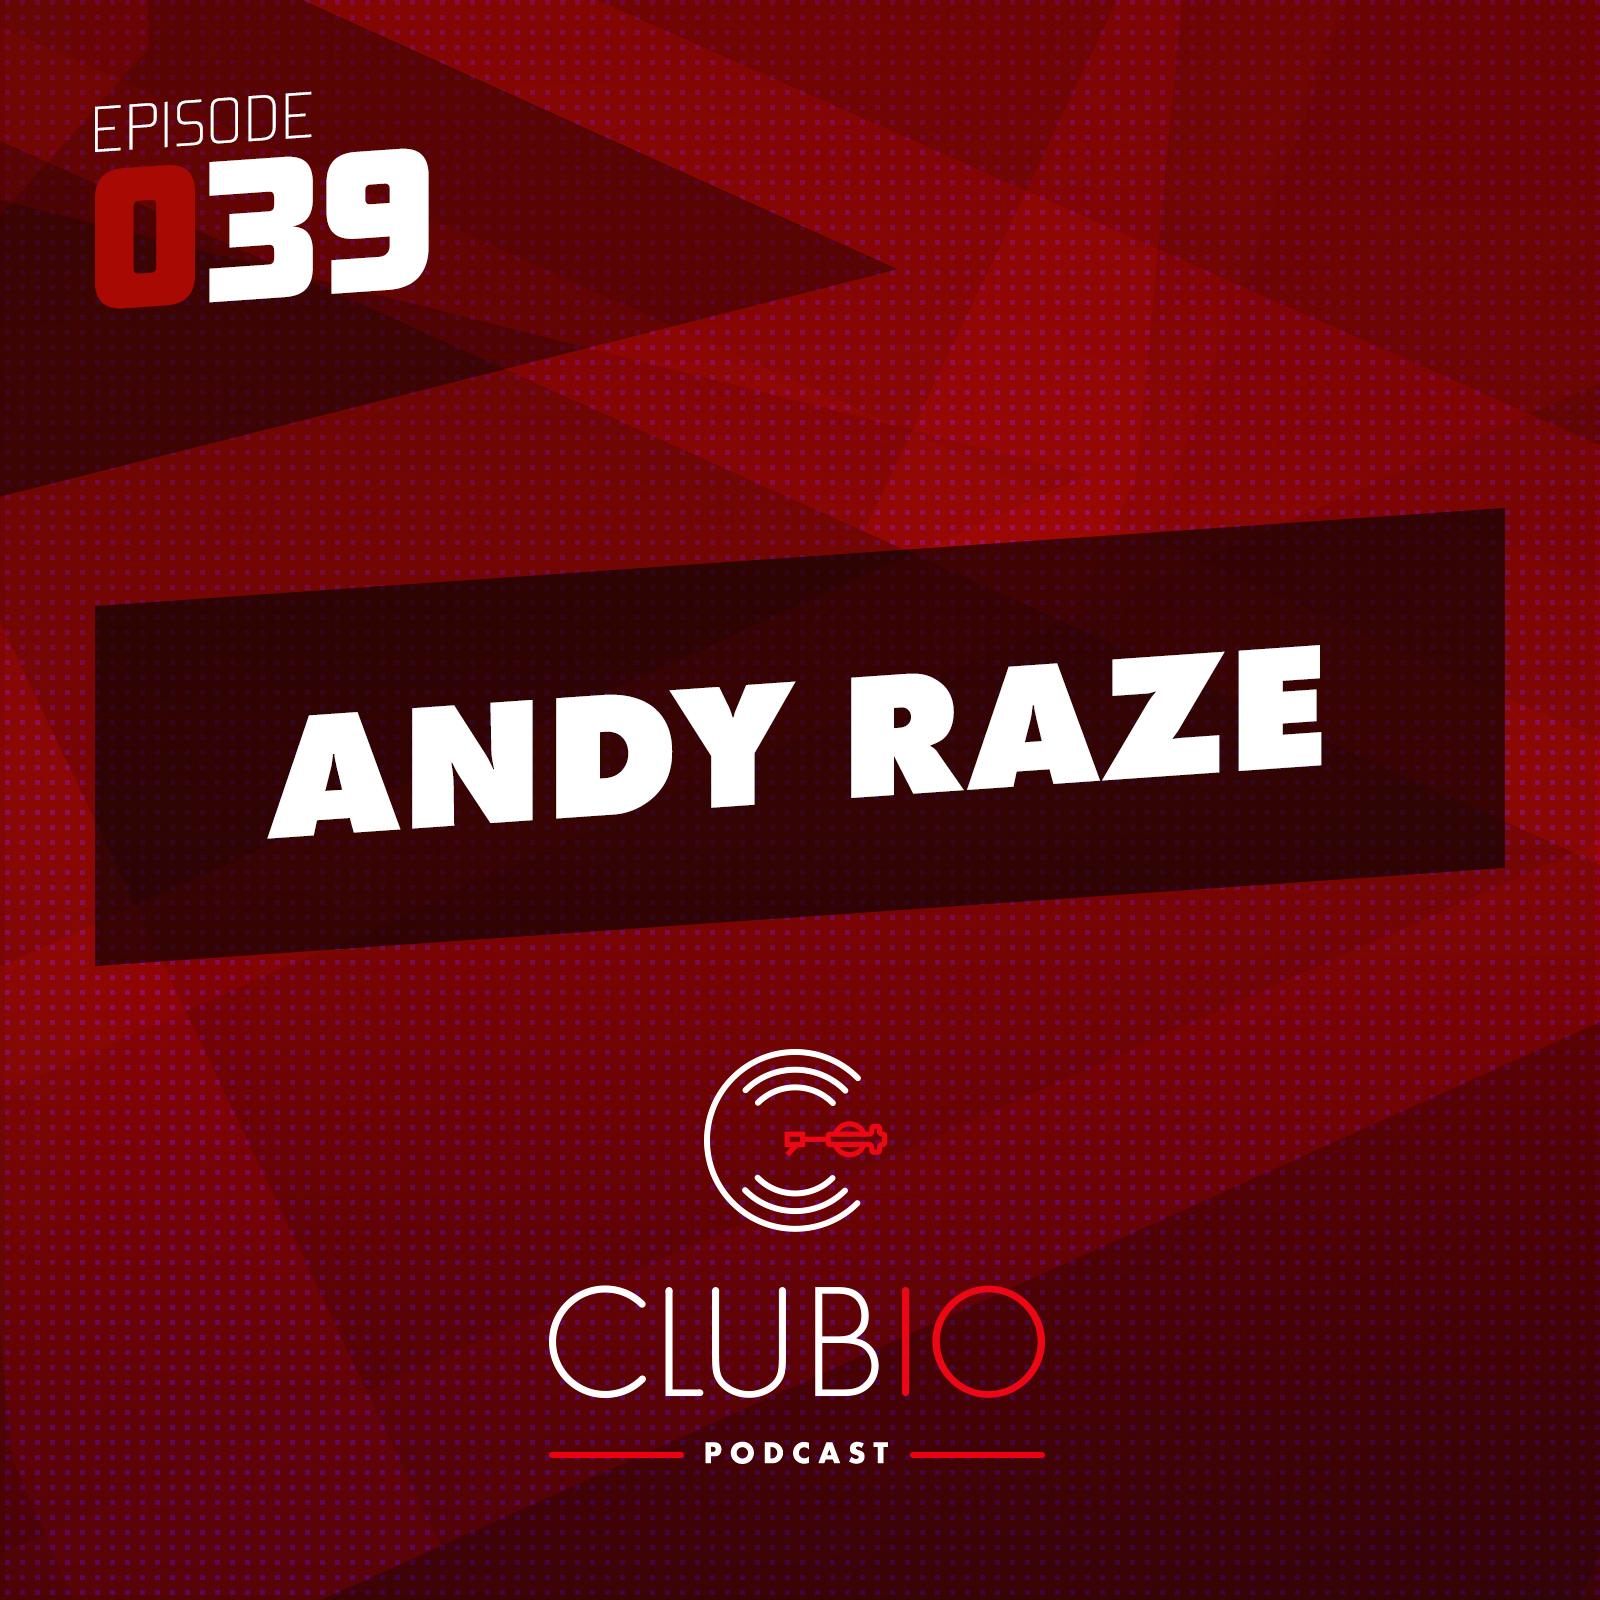 Clubio Podcast 039 - Andy Raze